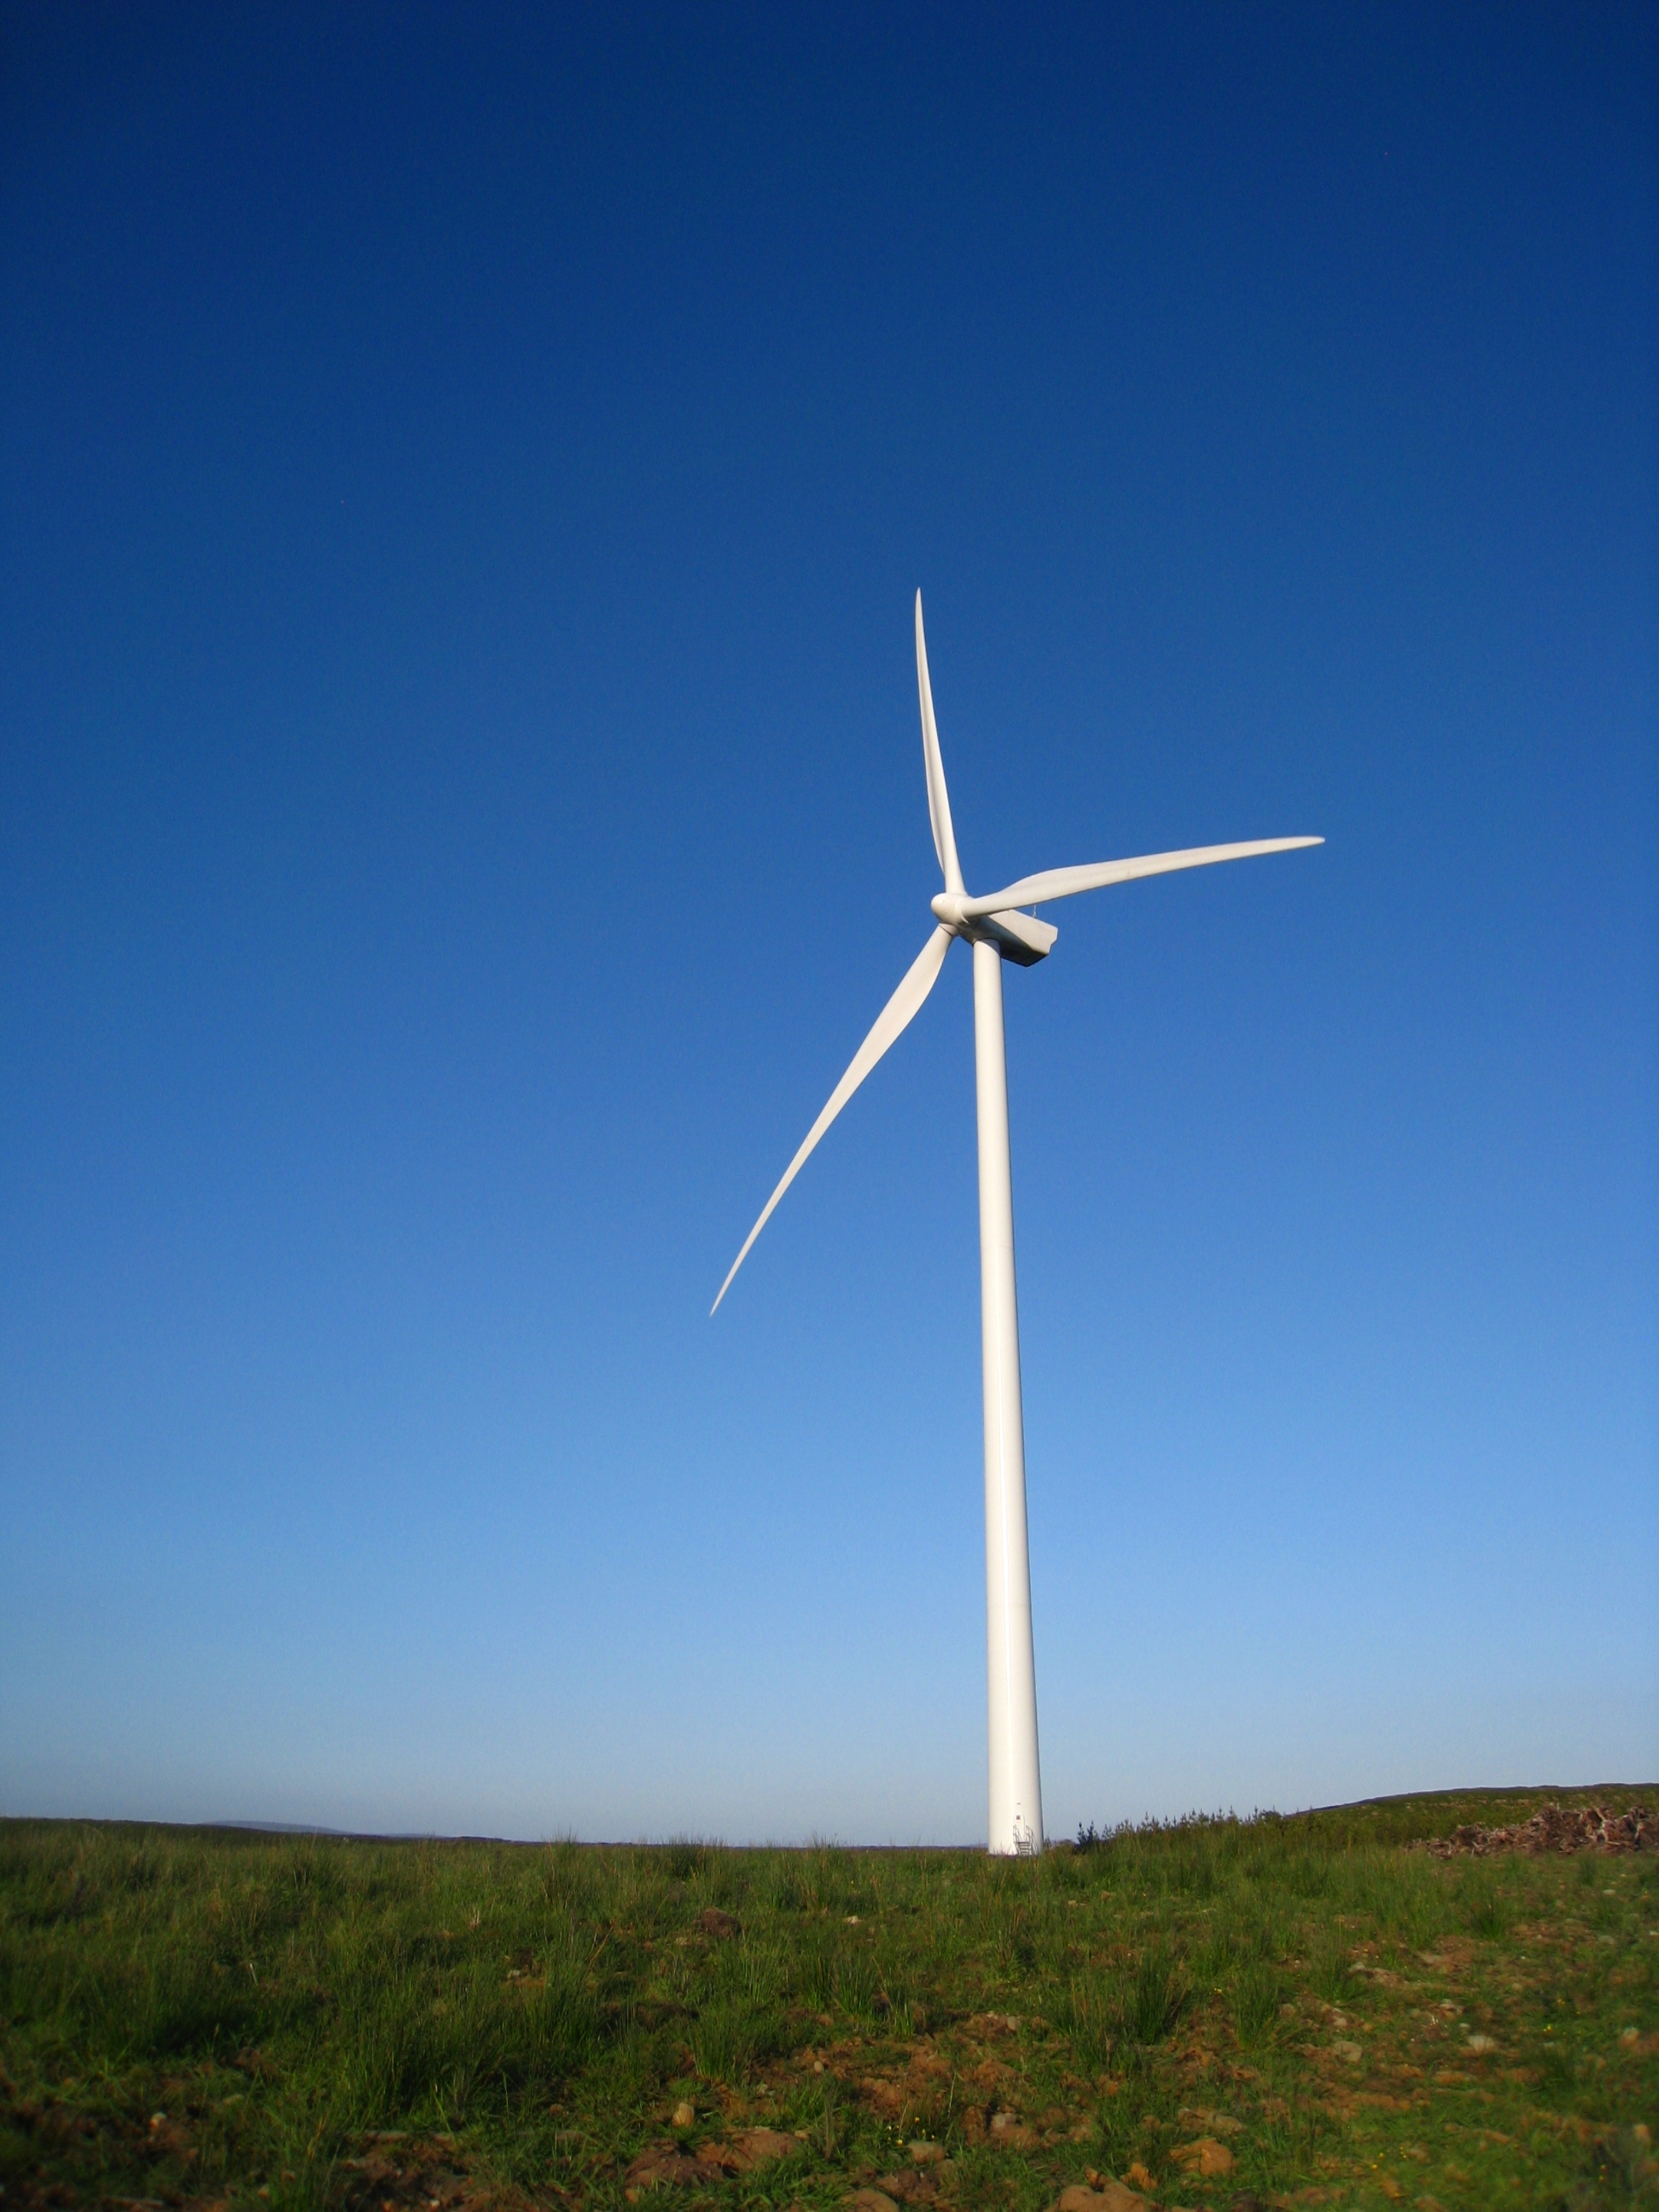 MK Turbine